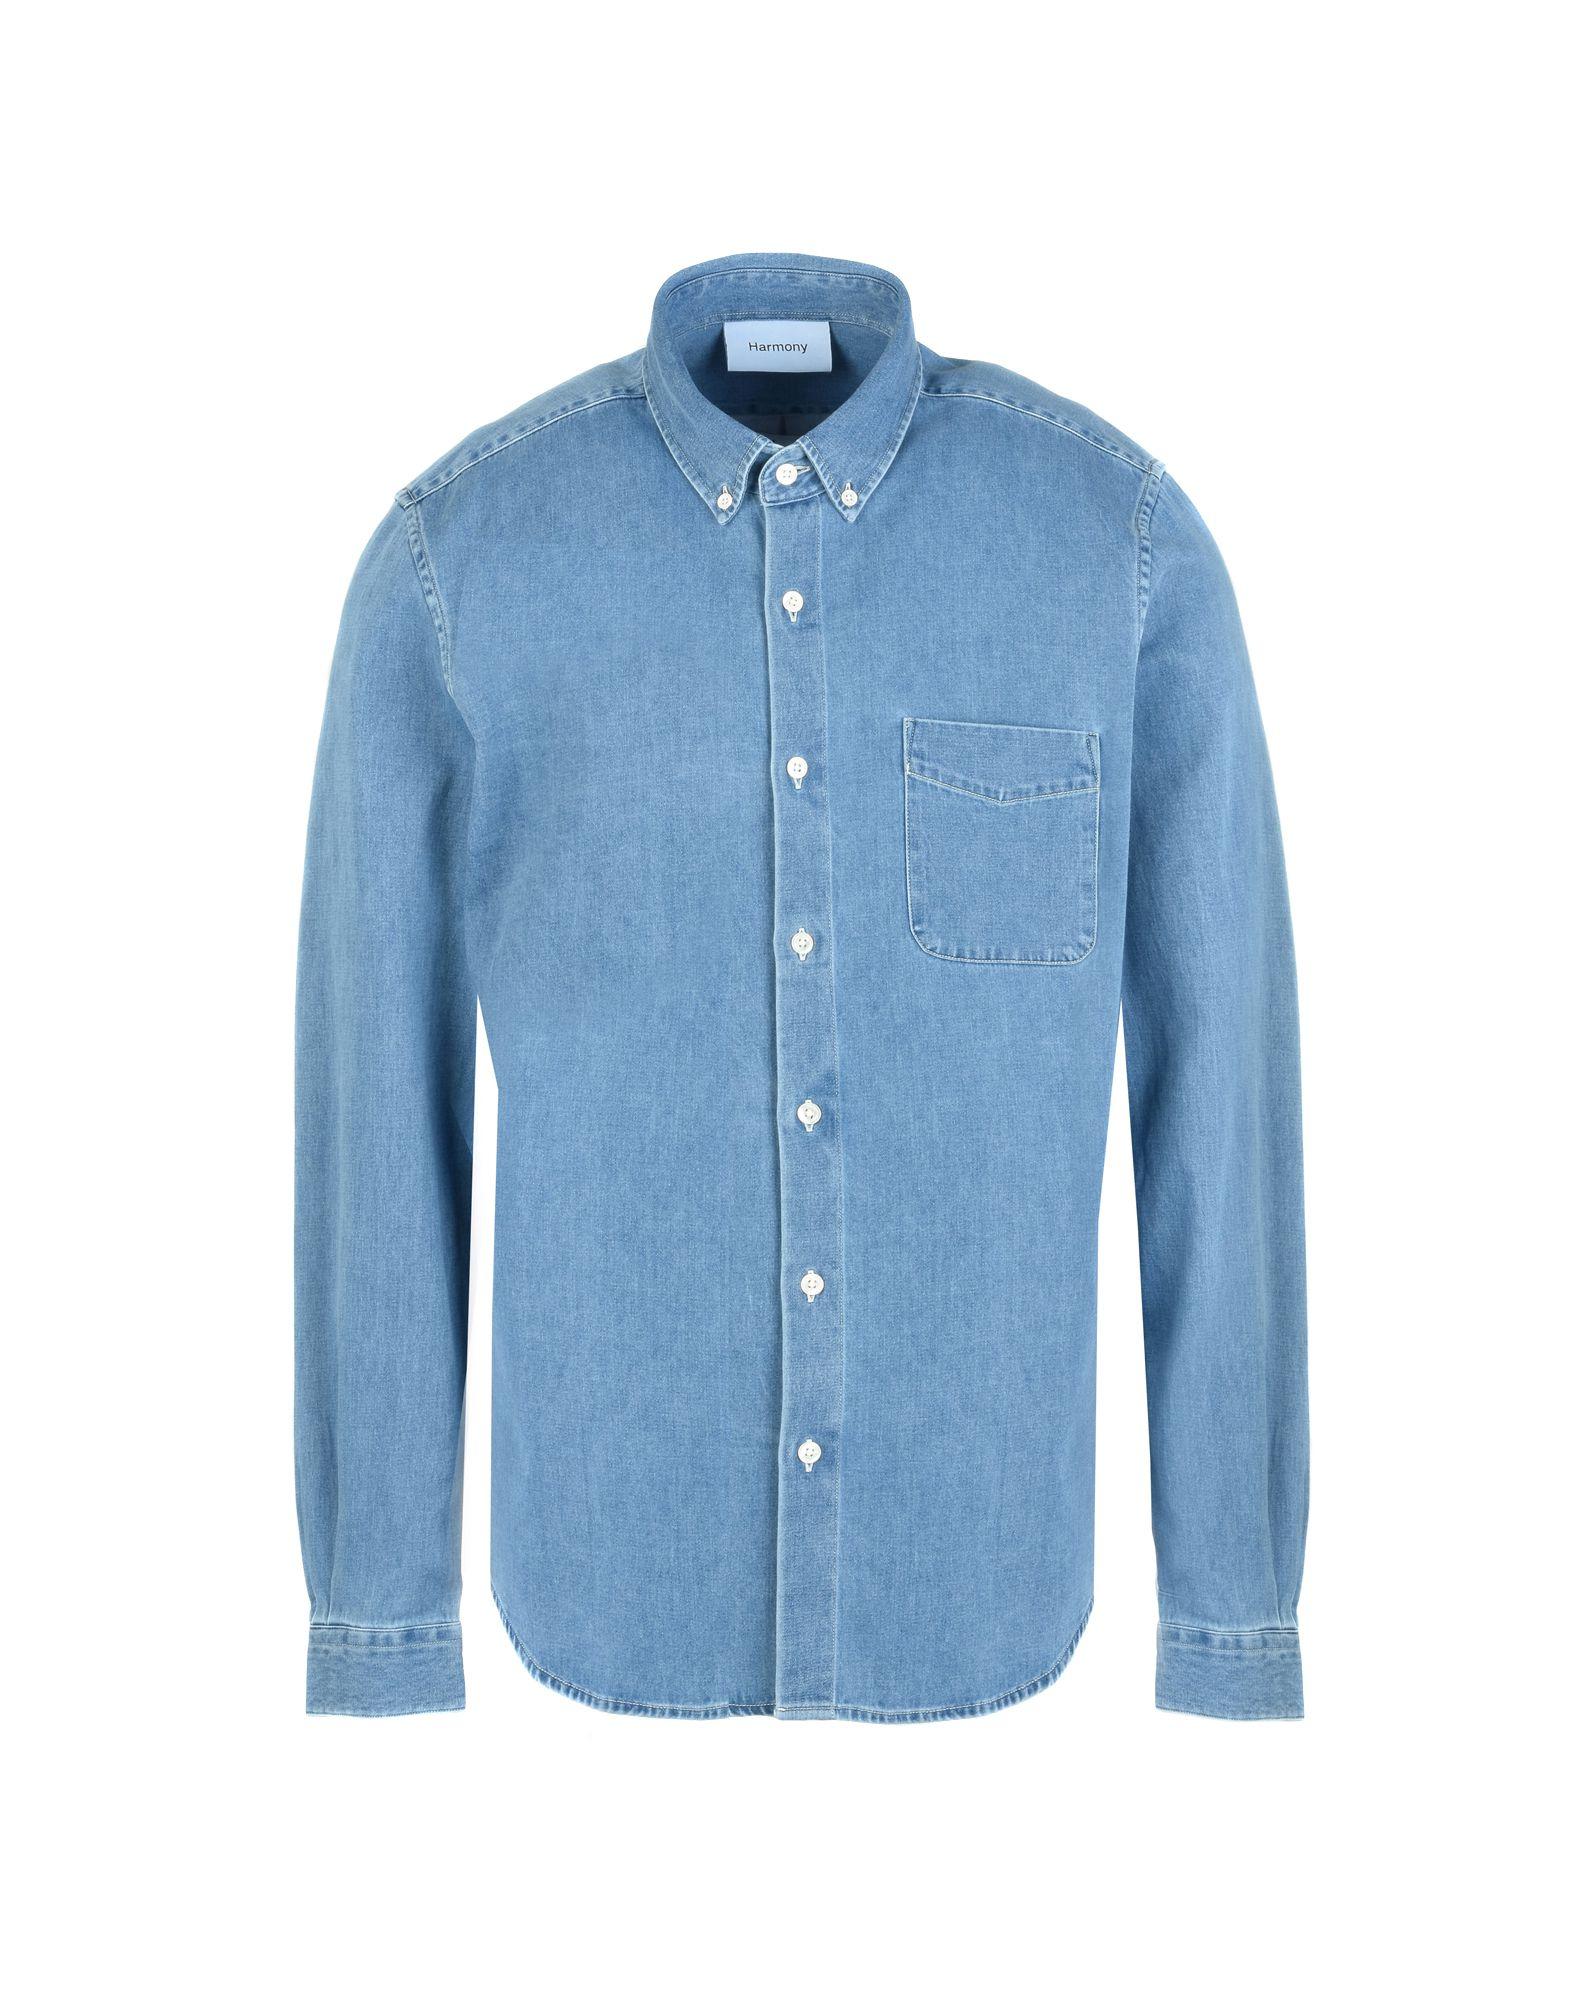 цена HARMONY Paris Джинсовая рубашка онлайн в 2017 году